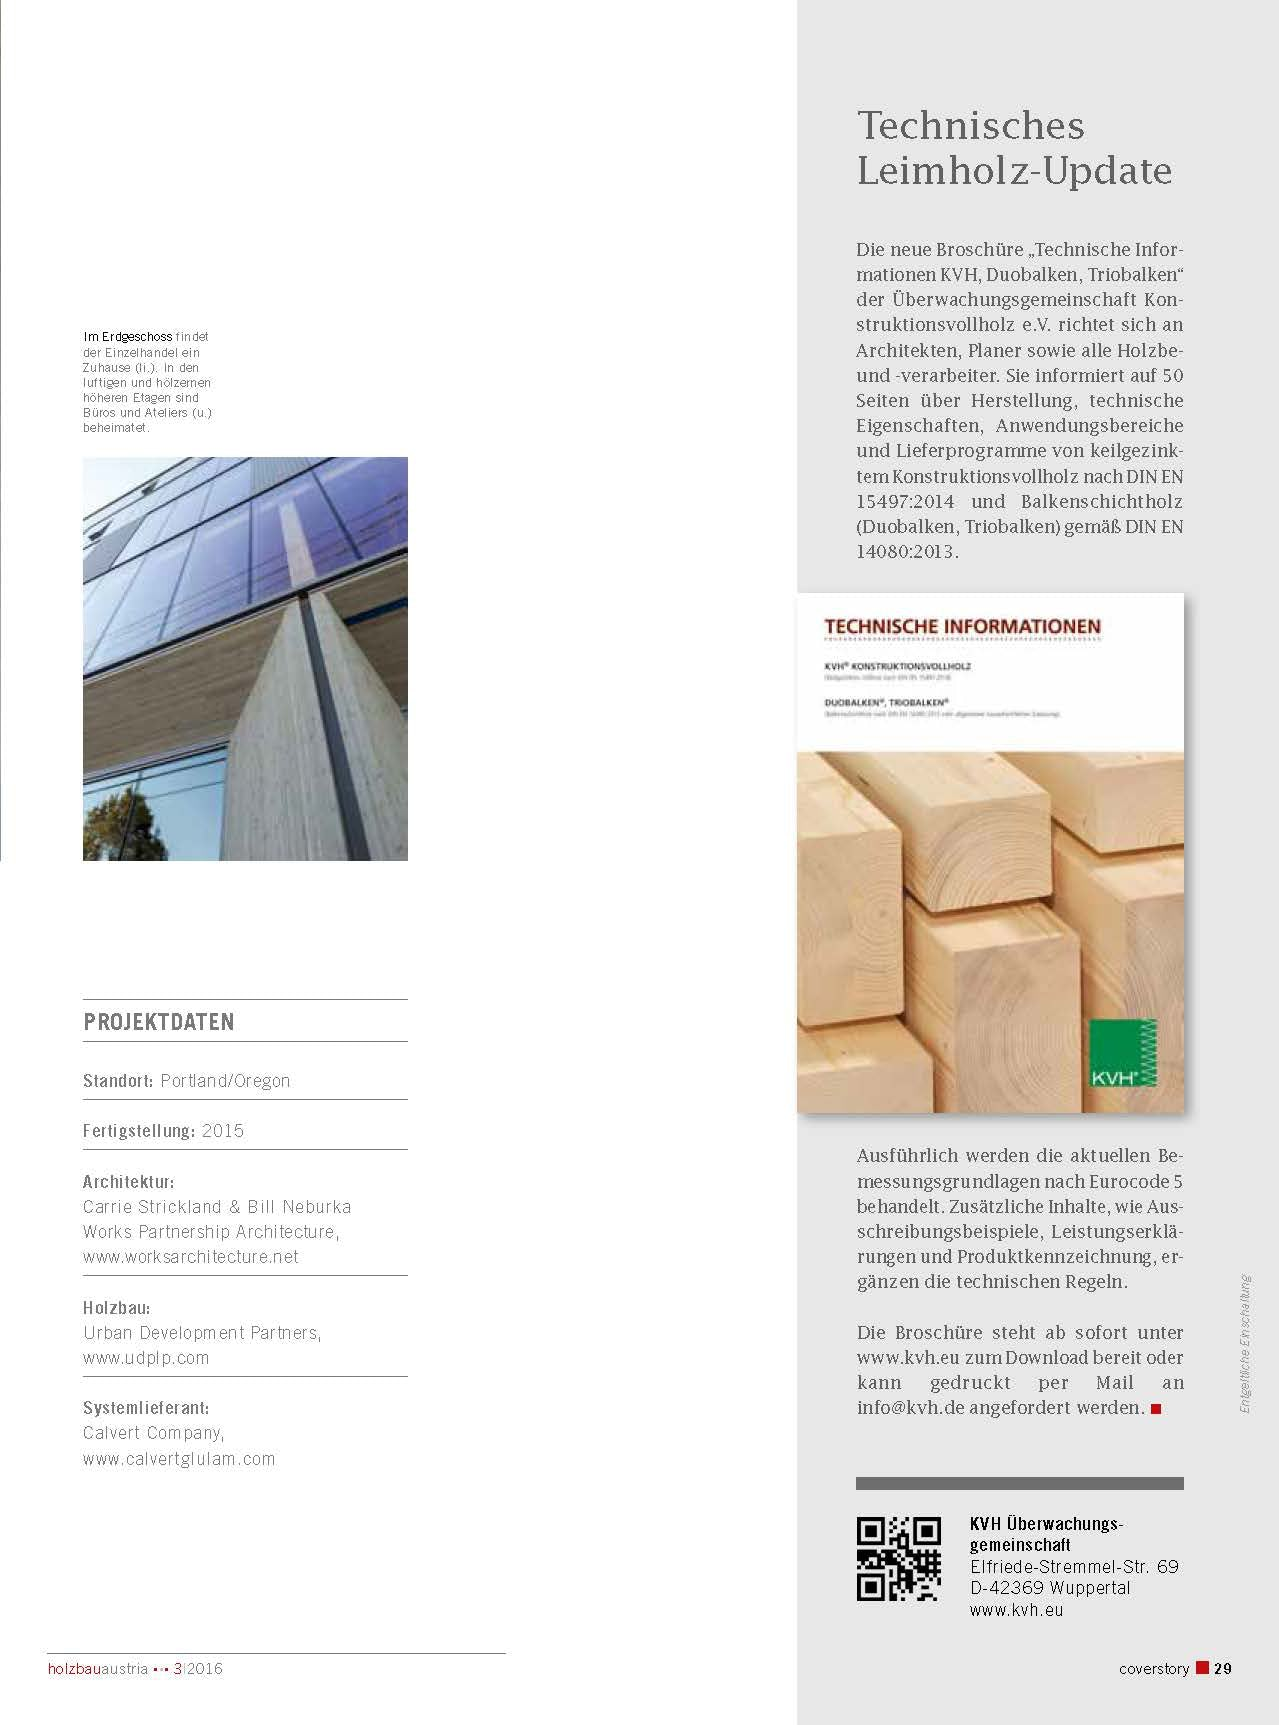 Framework hba03 2016 page 10